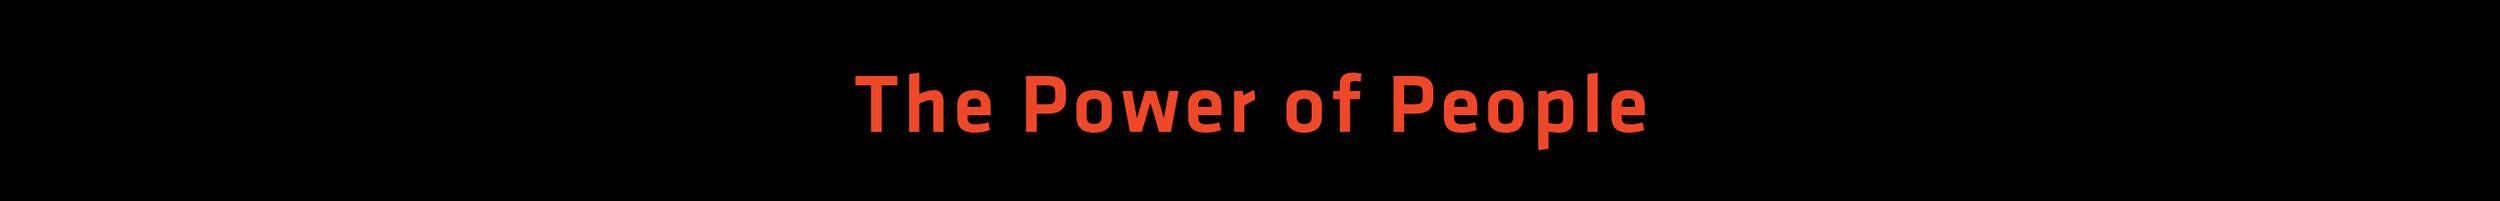 PowerofPeopleBanner.png